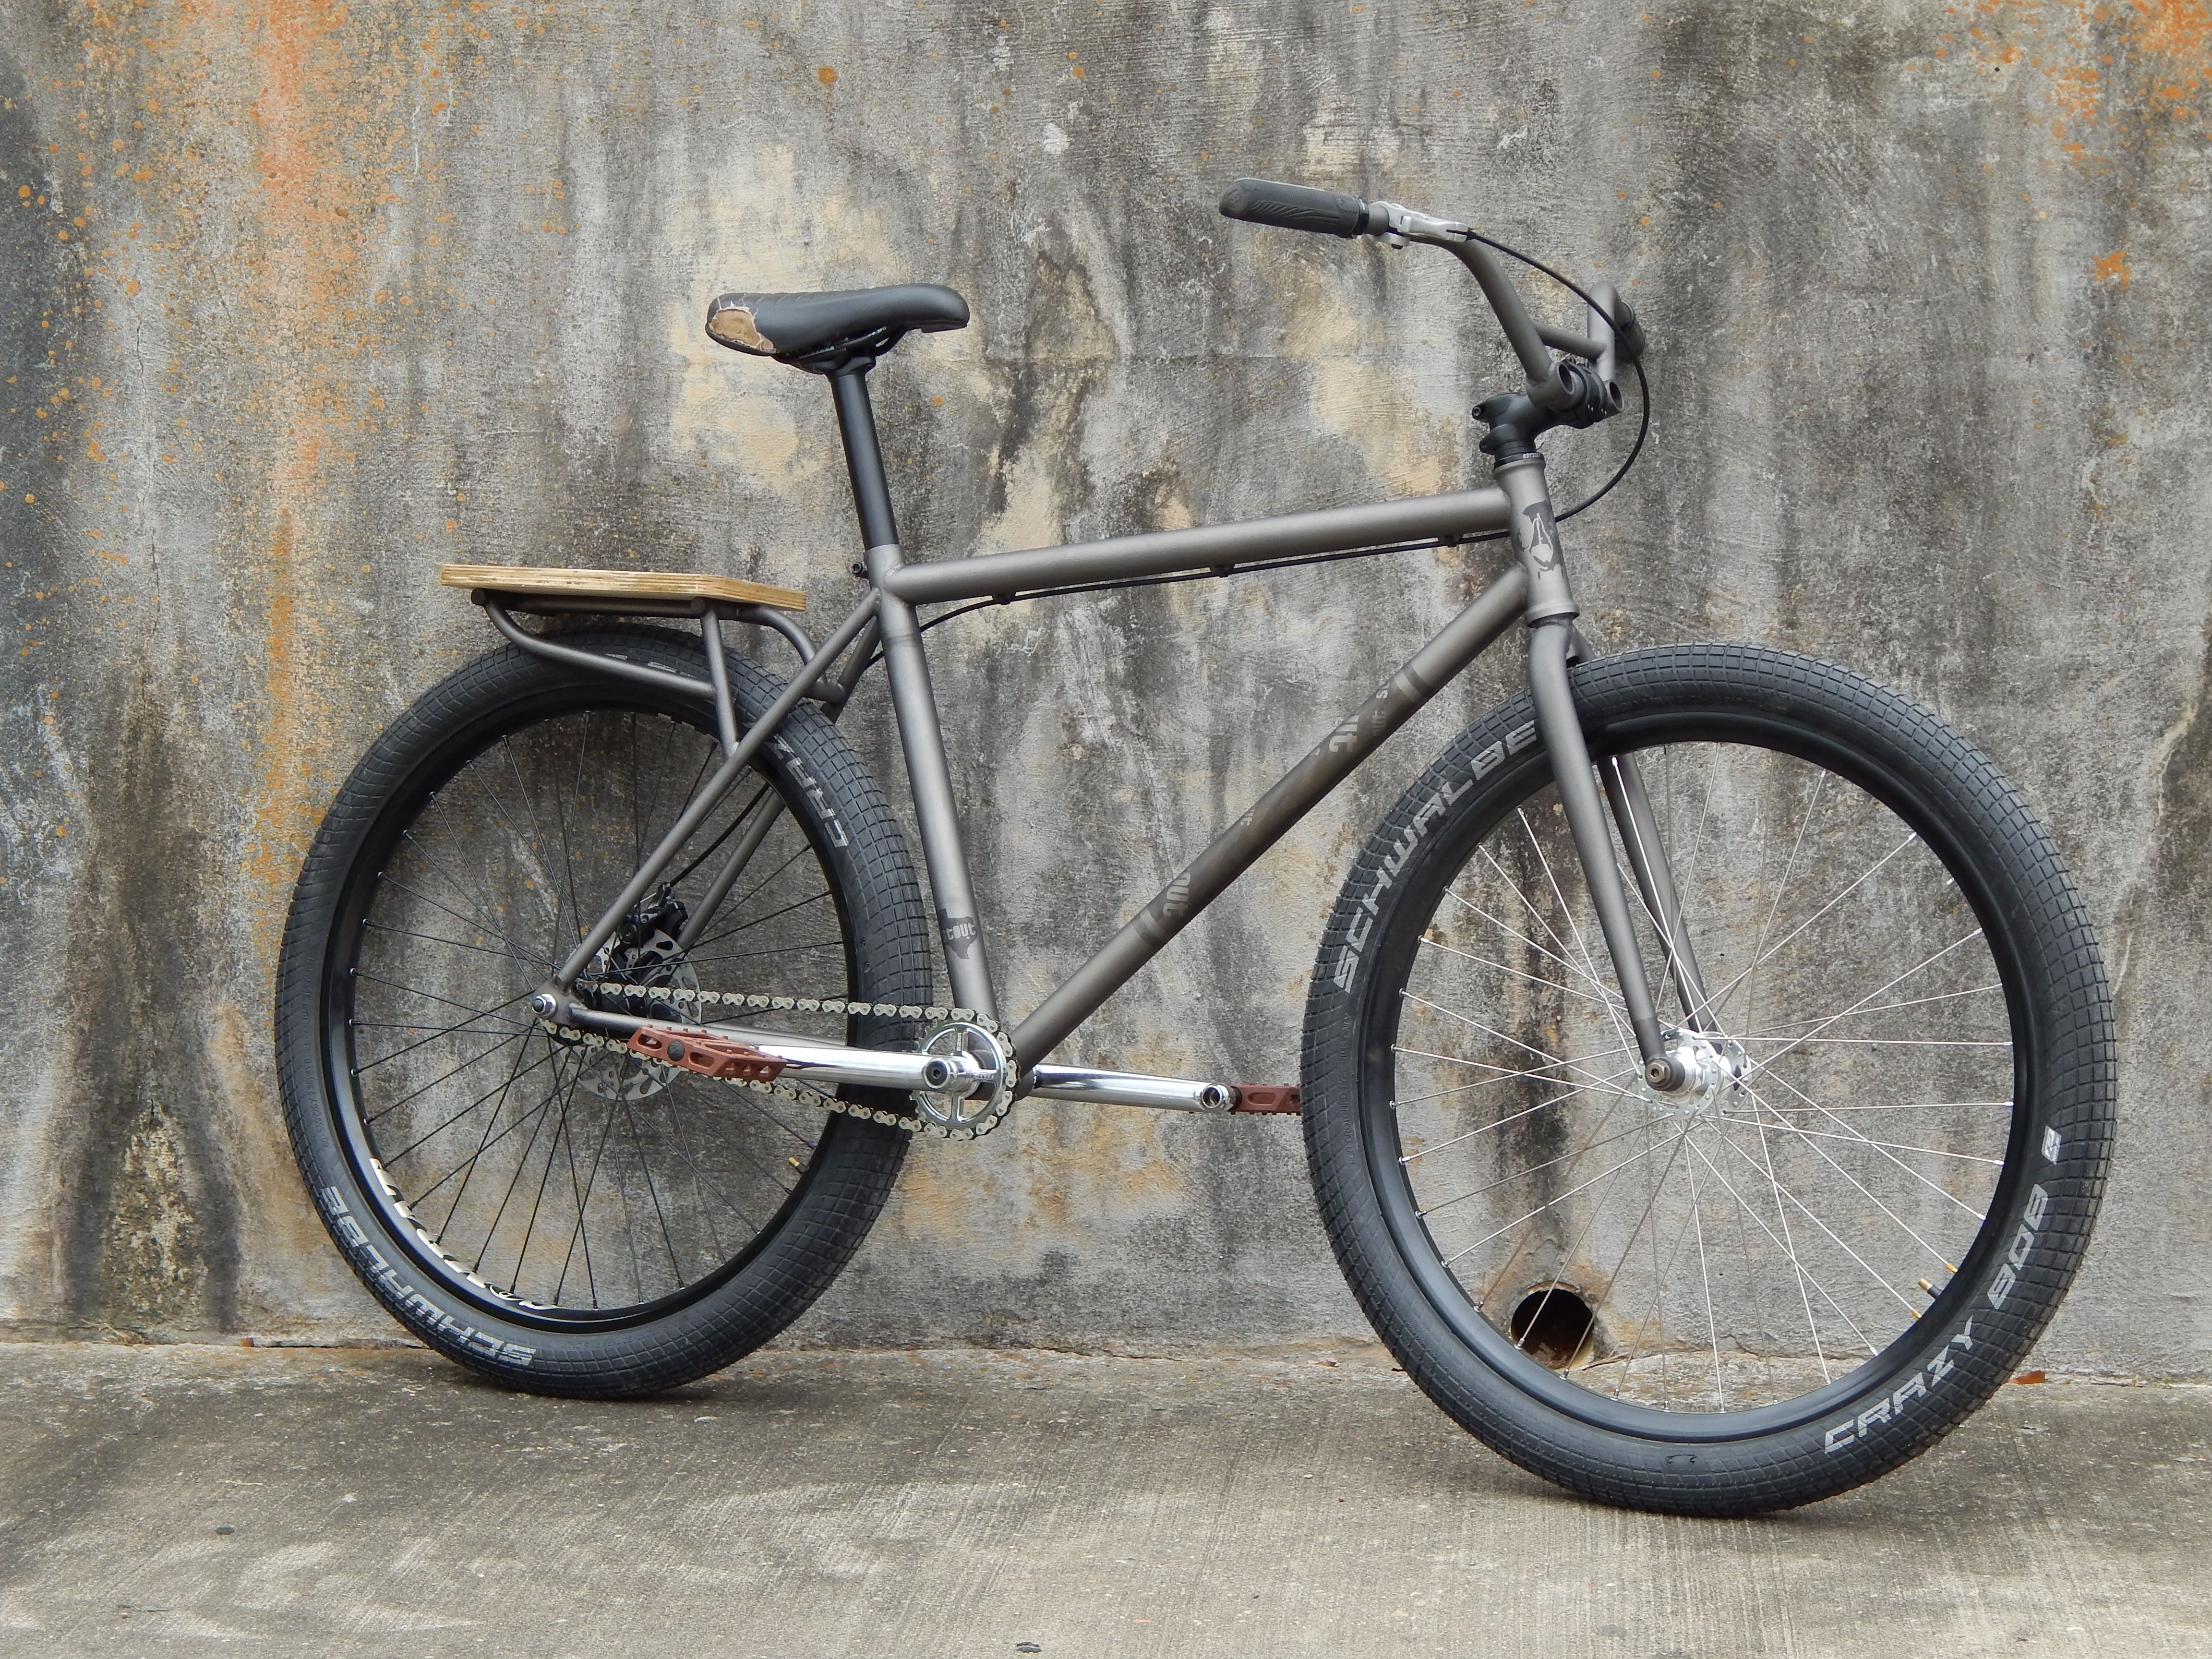 Pin By Zlatko Vidic On Cool Ride Bmx Bikes Bmx Cruiser